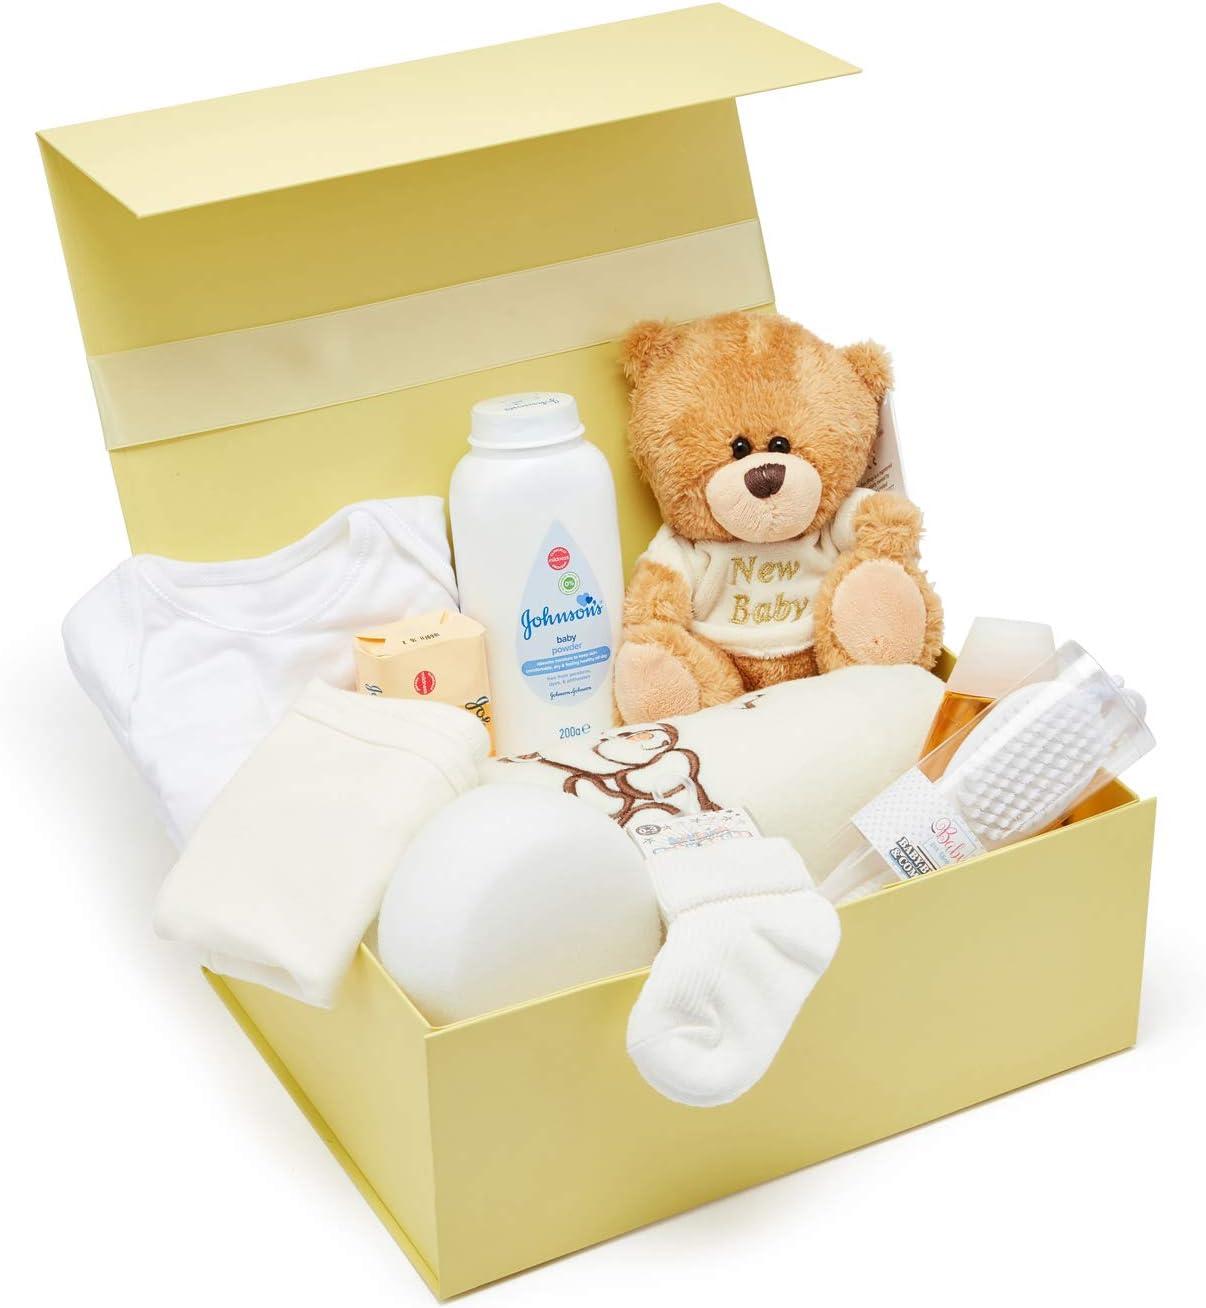 Cesta regalo beb/é ni/ño para baby shower con todo lo esencial para bebes reci/én nacidos con osito de peluche y caja de recuerdos azul Baby Box Shop